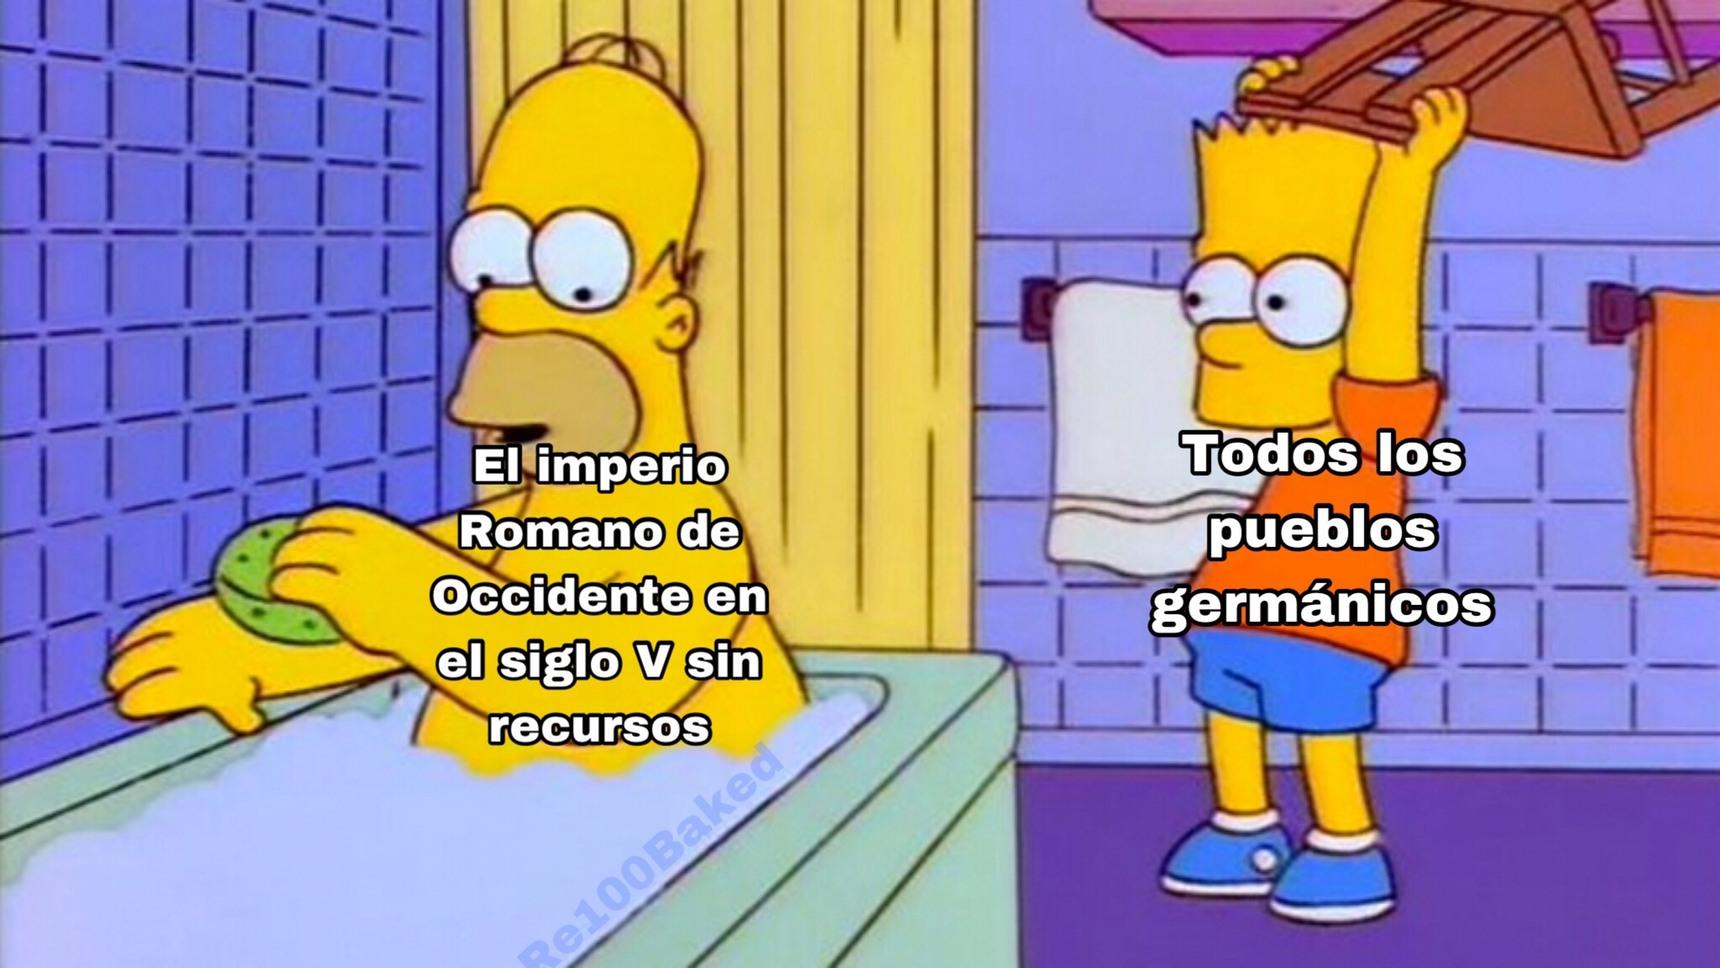 Meme Histórico para una vuelta a Memedroid